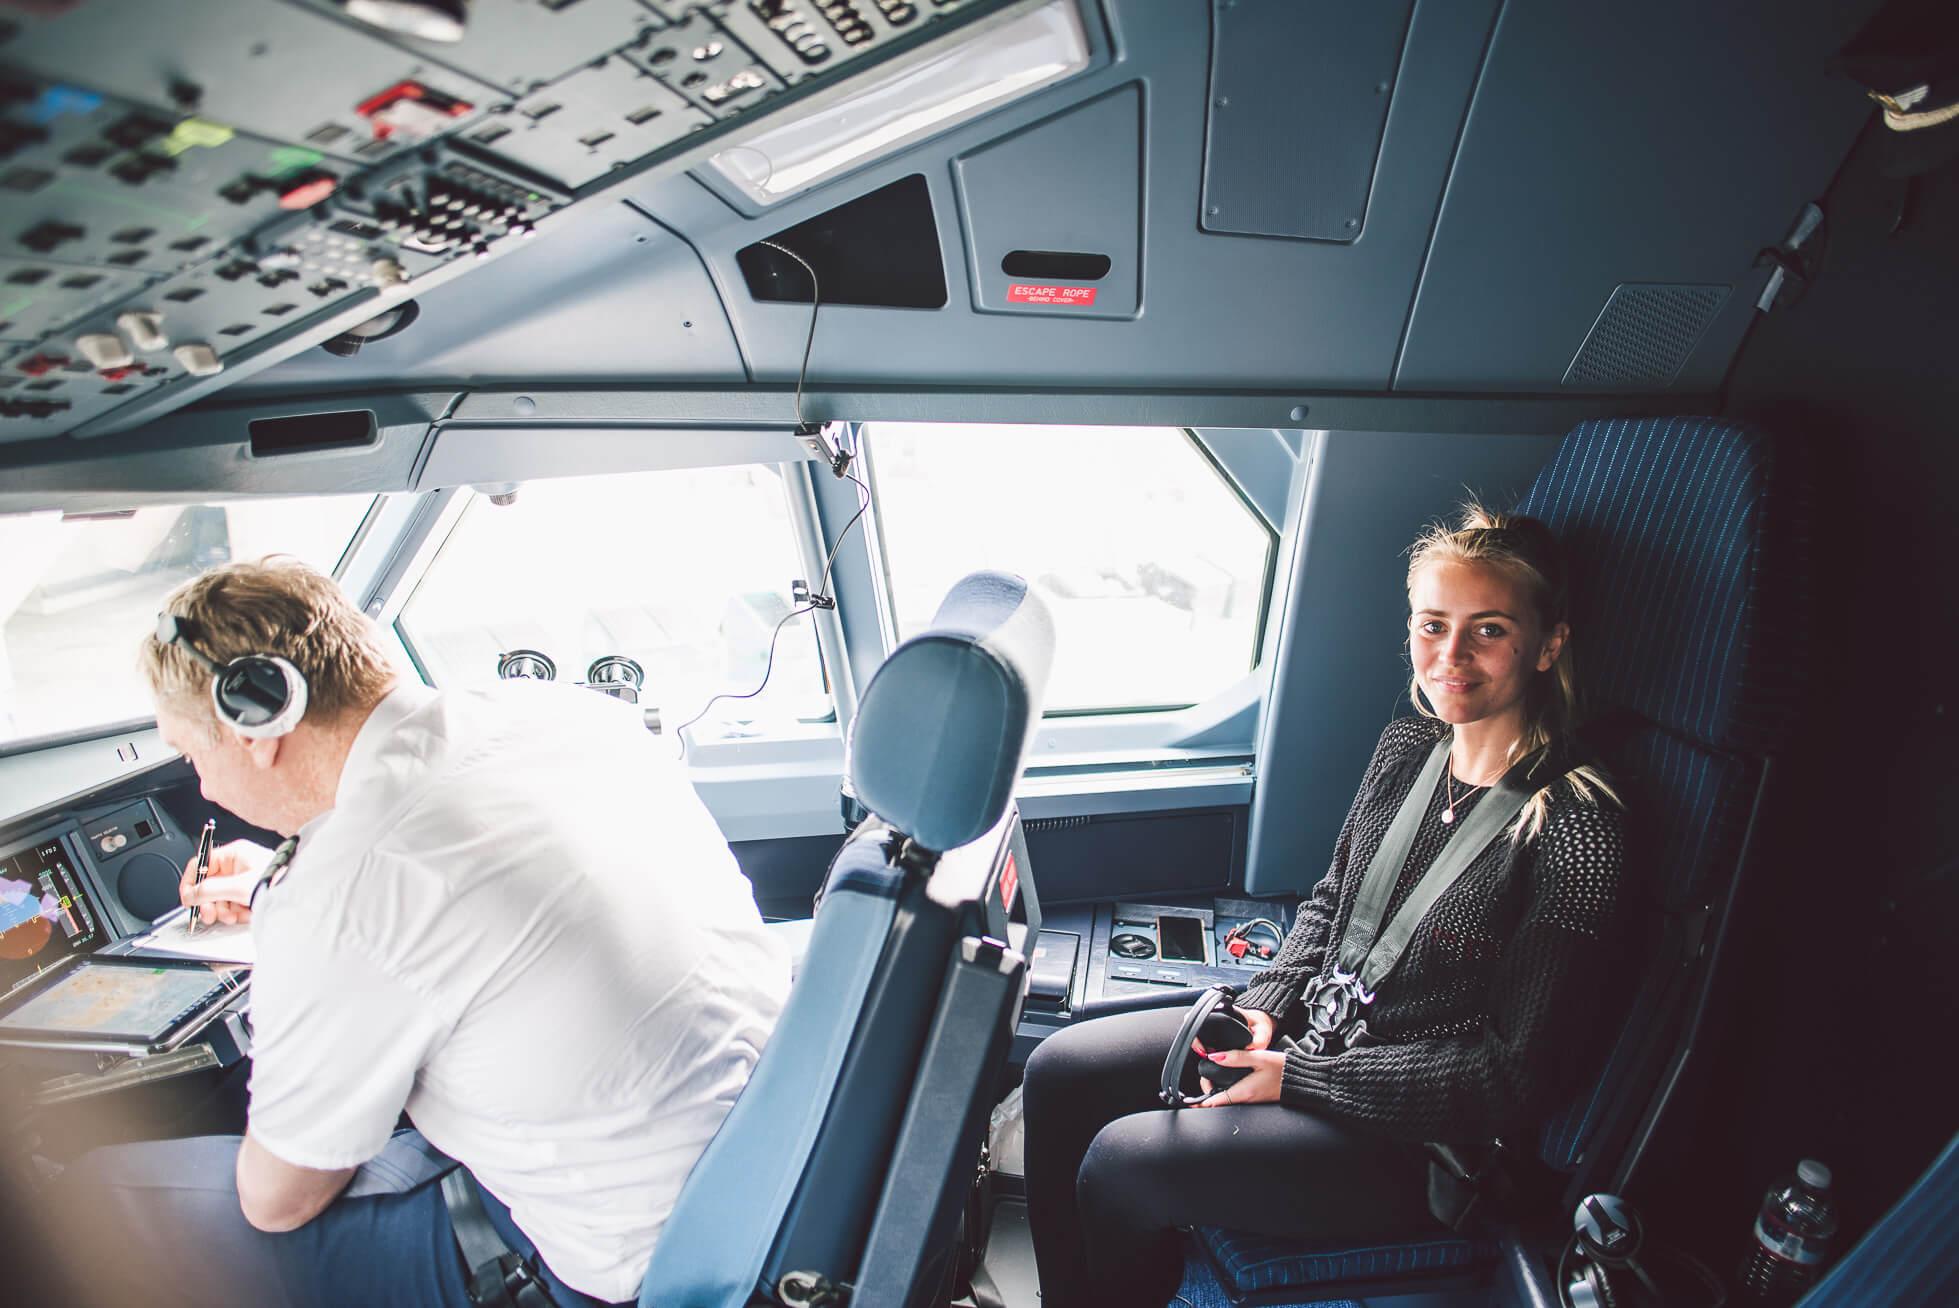 janni-deler-flight-mode-sasDSC_1522